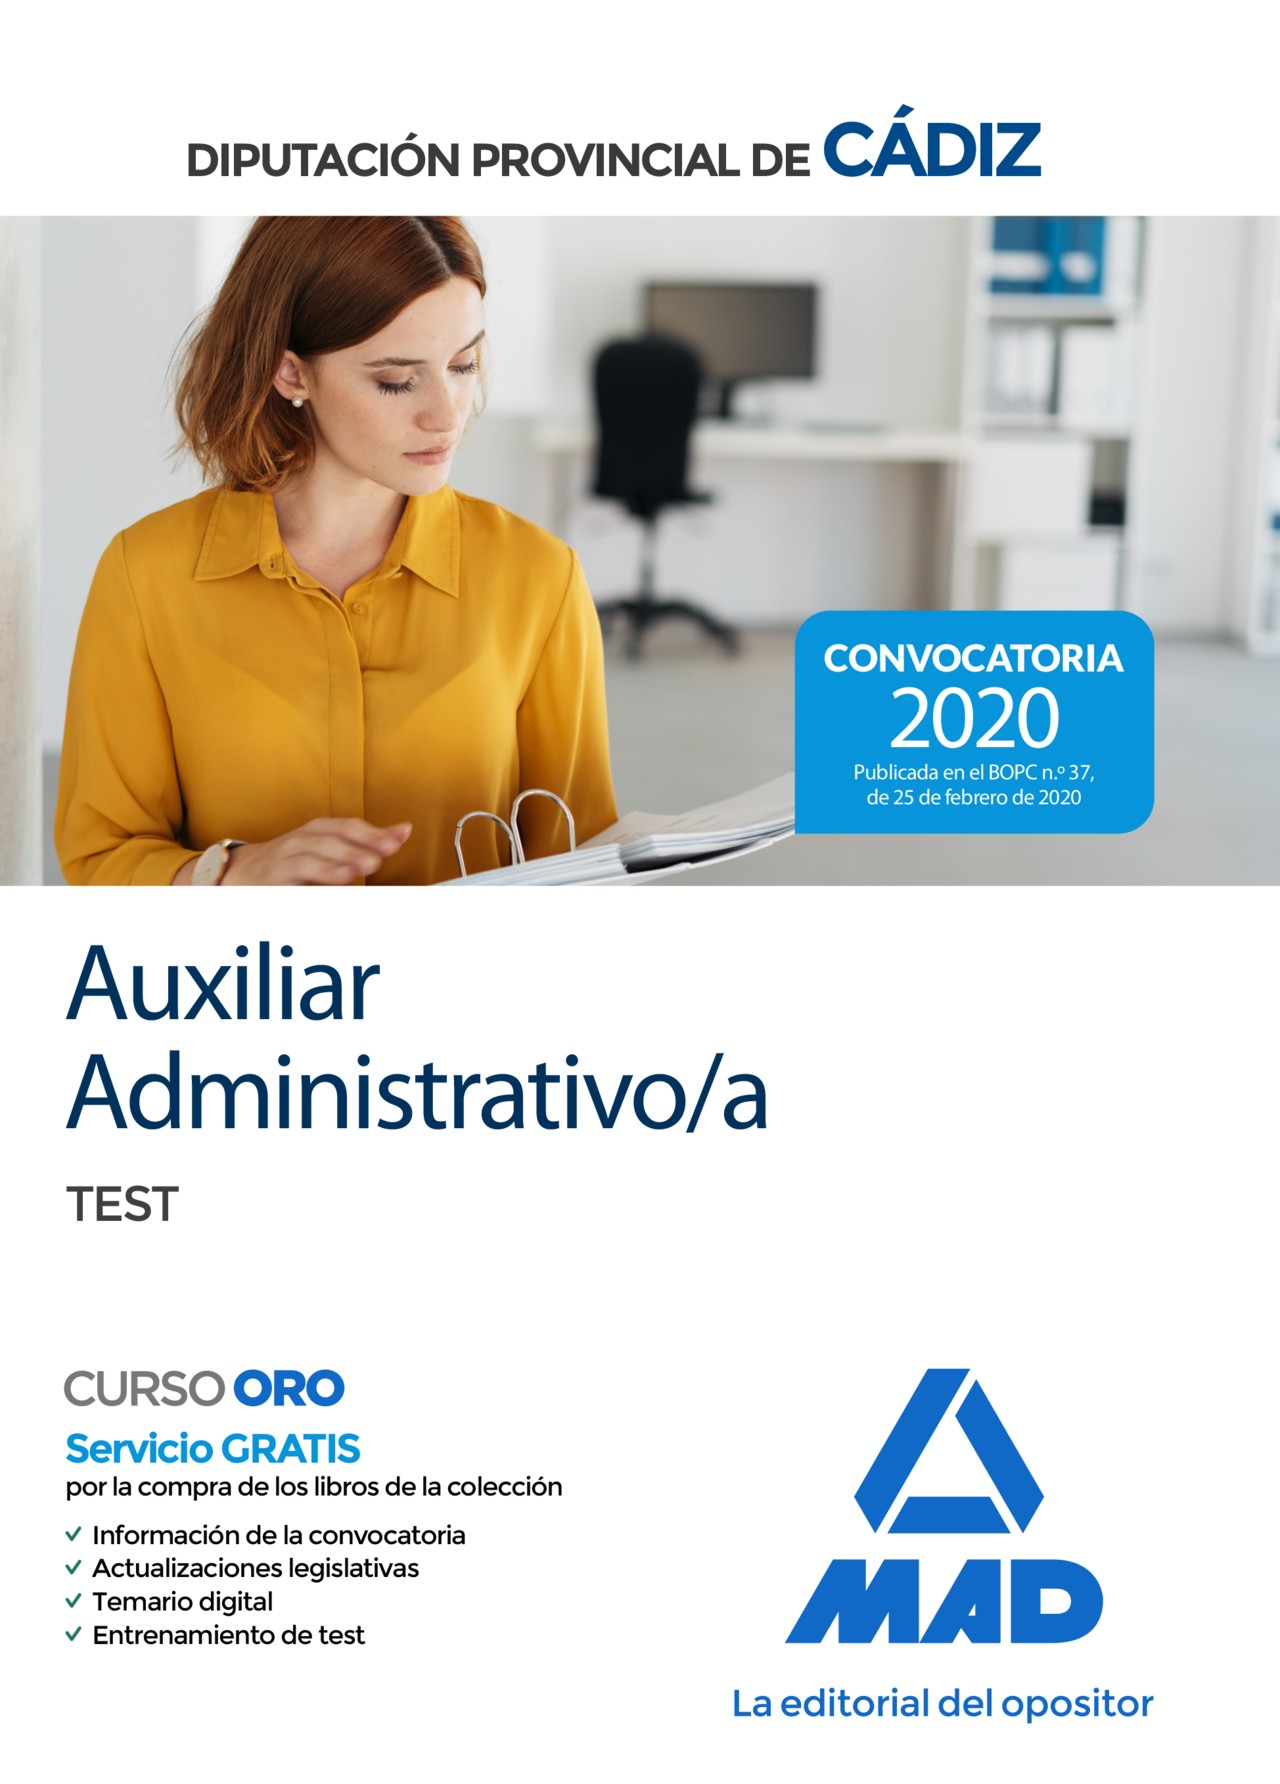 Auxiliar Administrativo/a de la Diputación Provincial de Cádiz